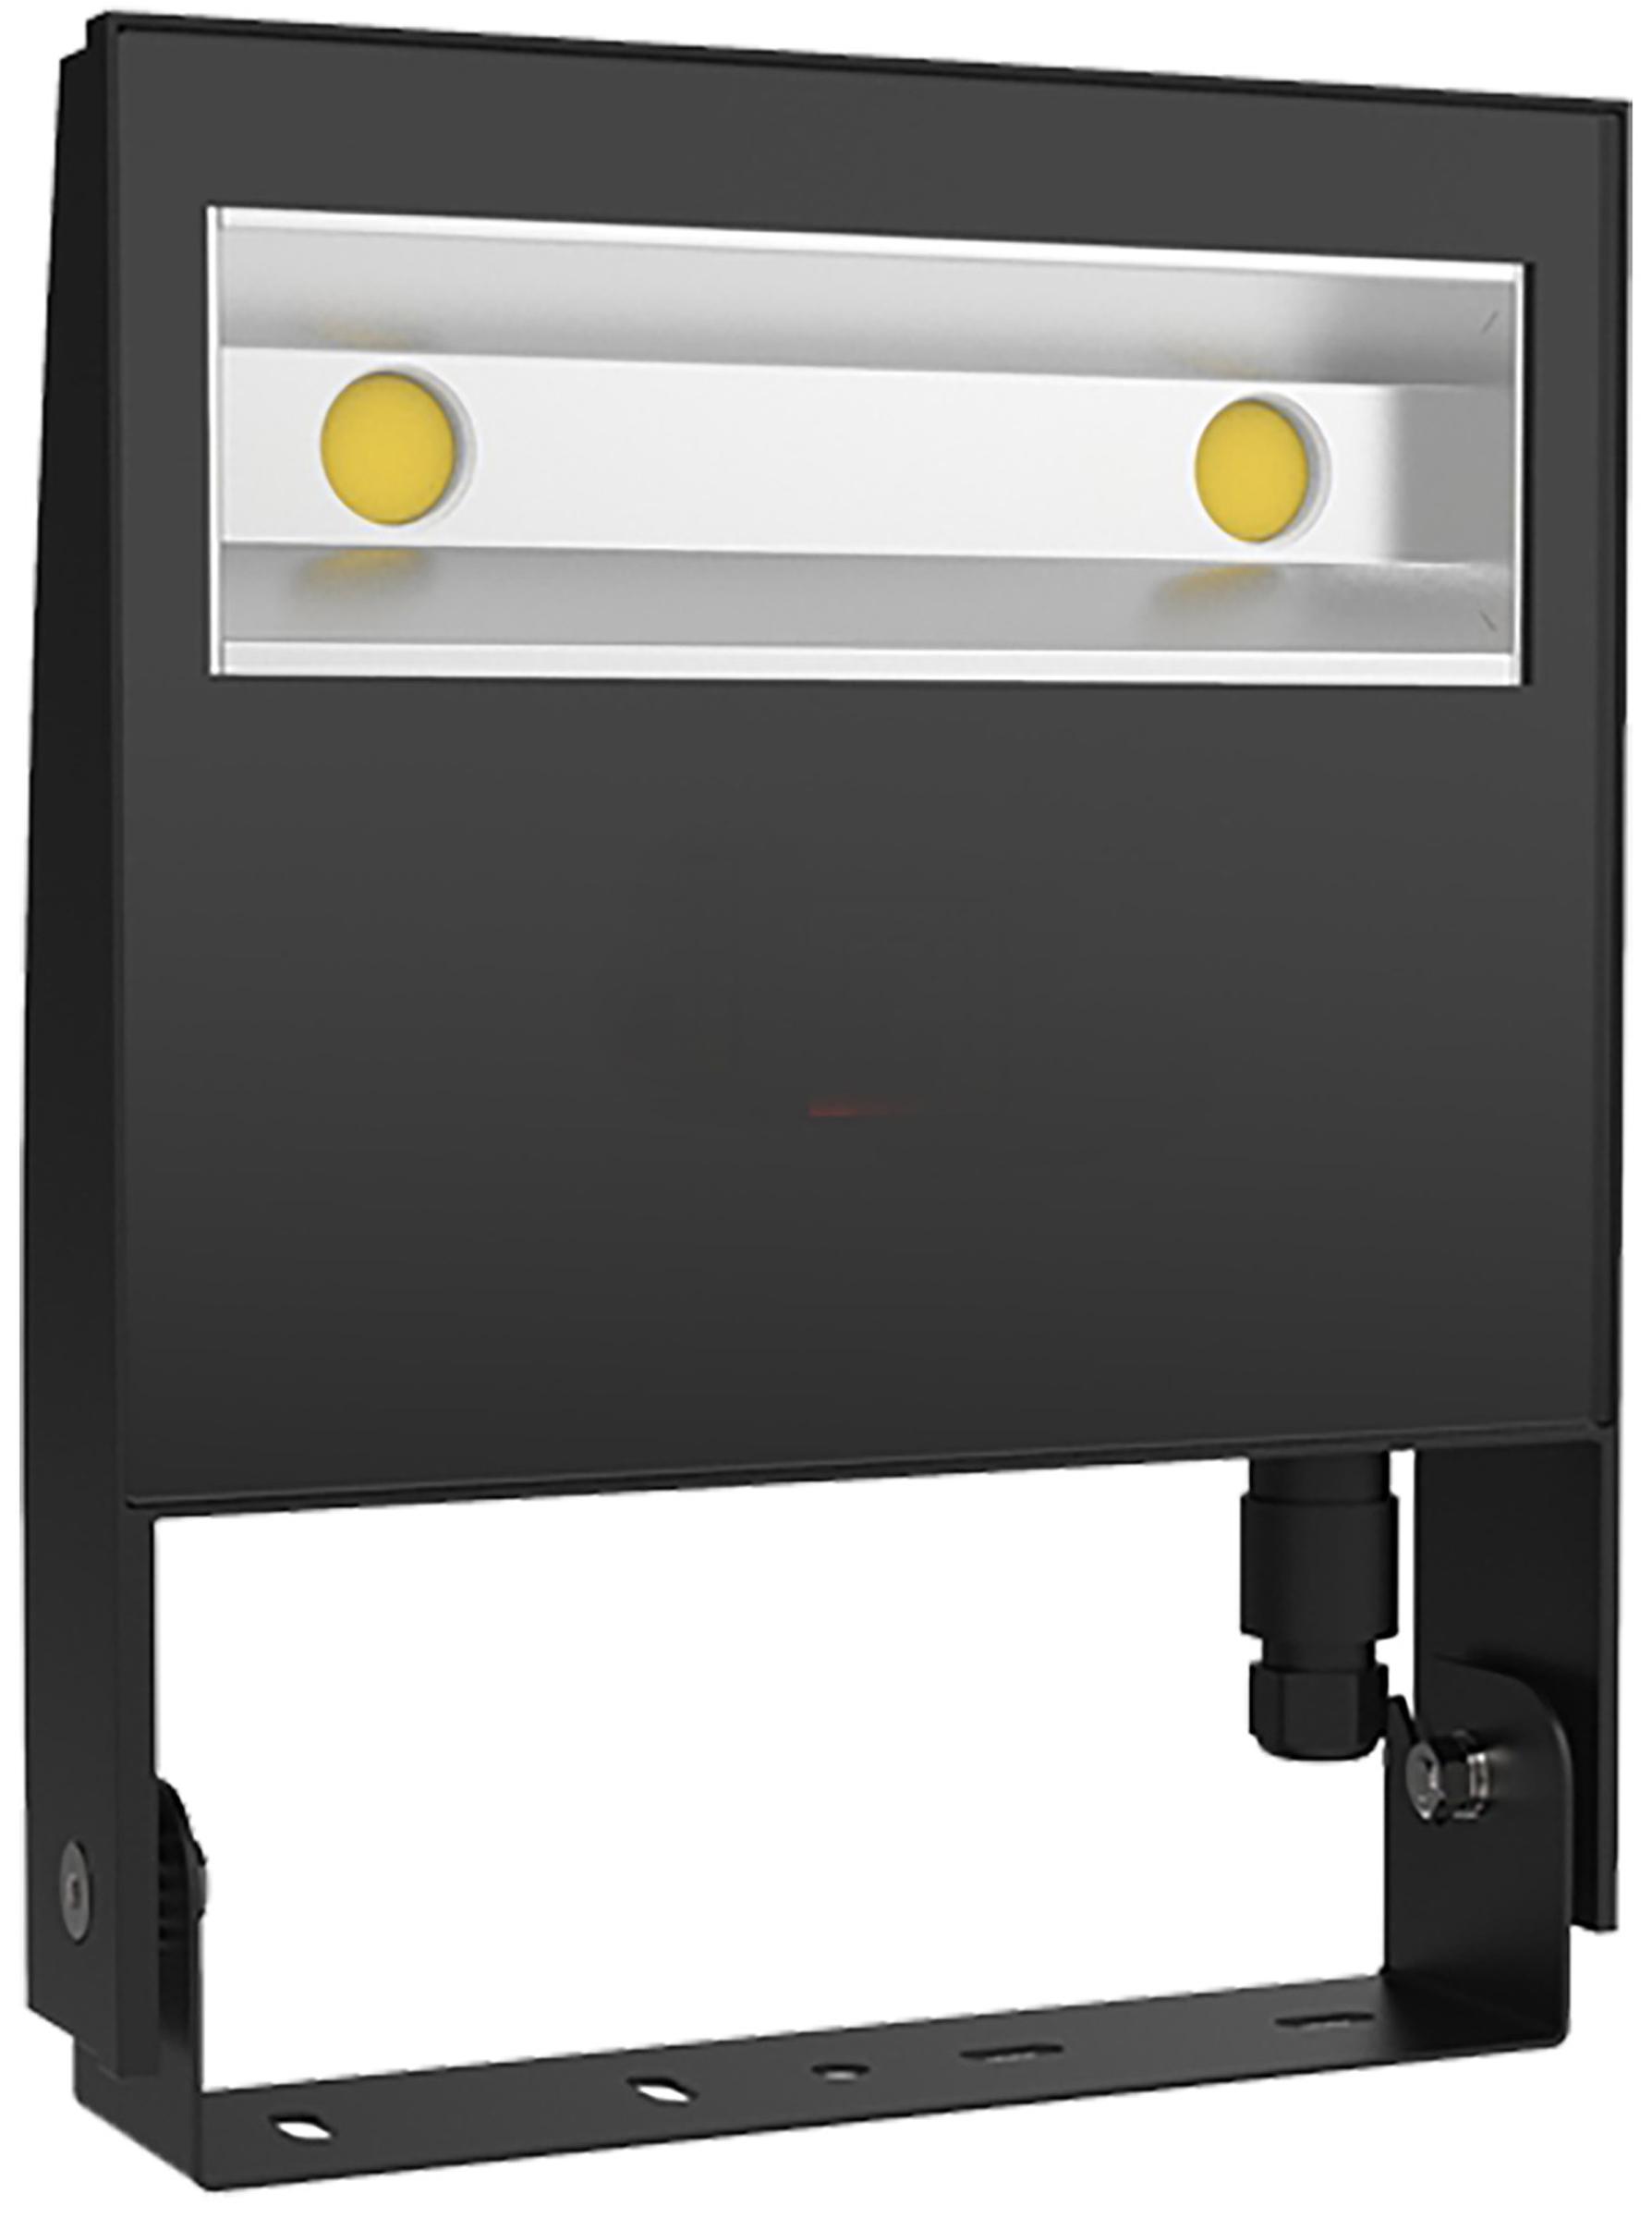 Schake Profi LED-Strahler